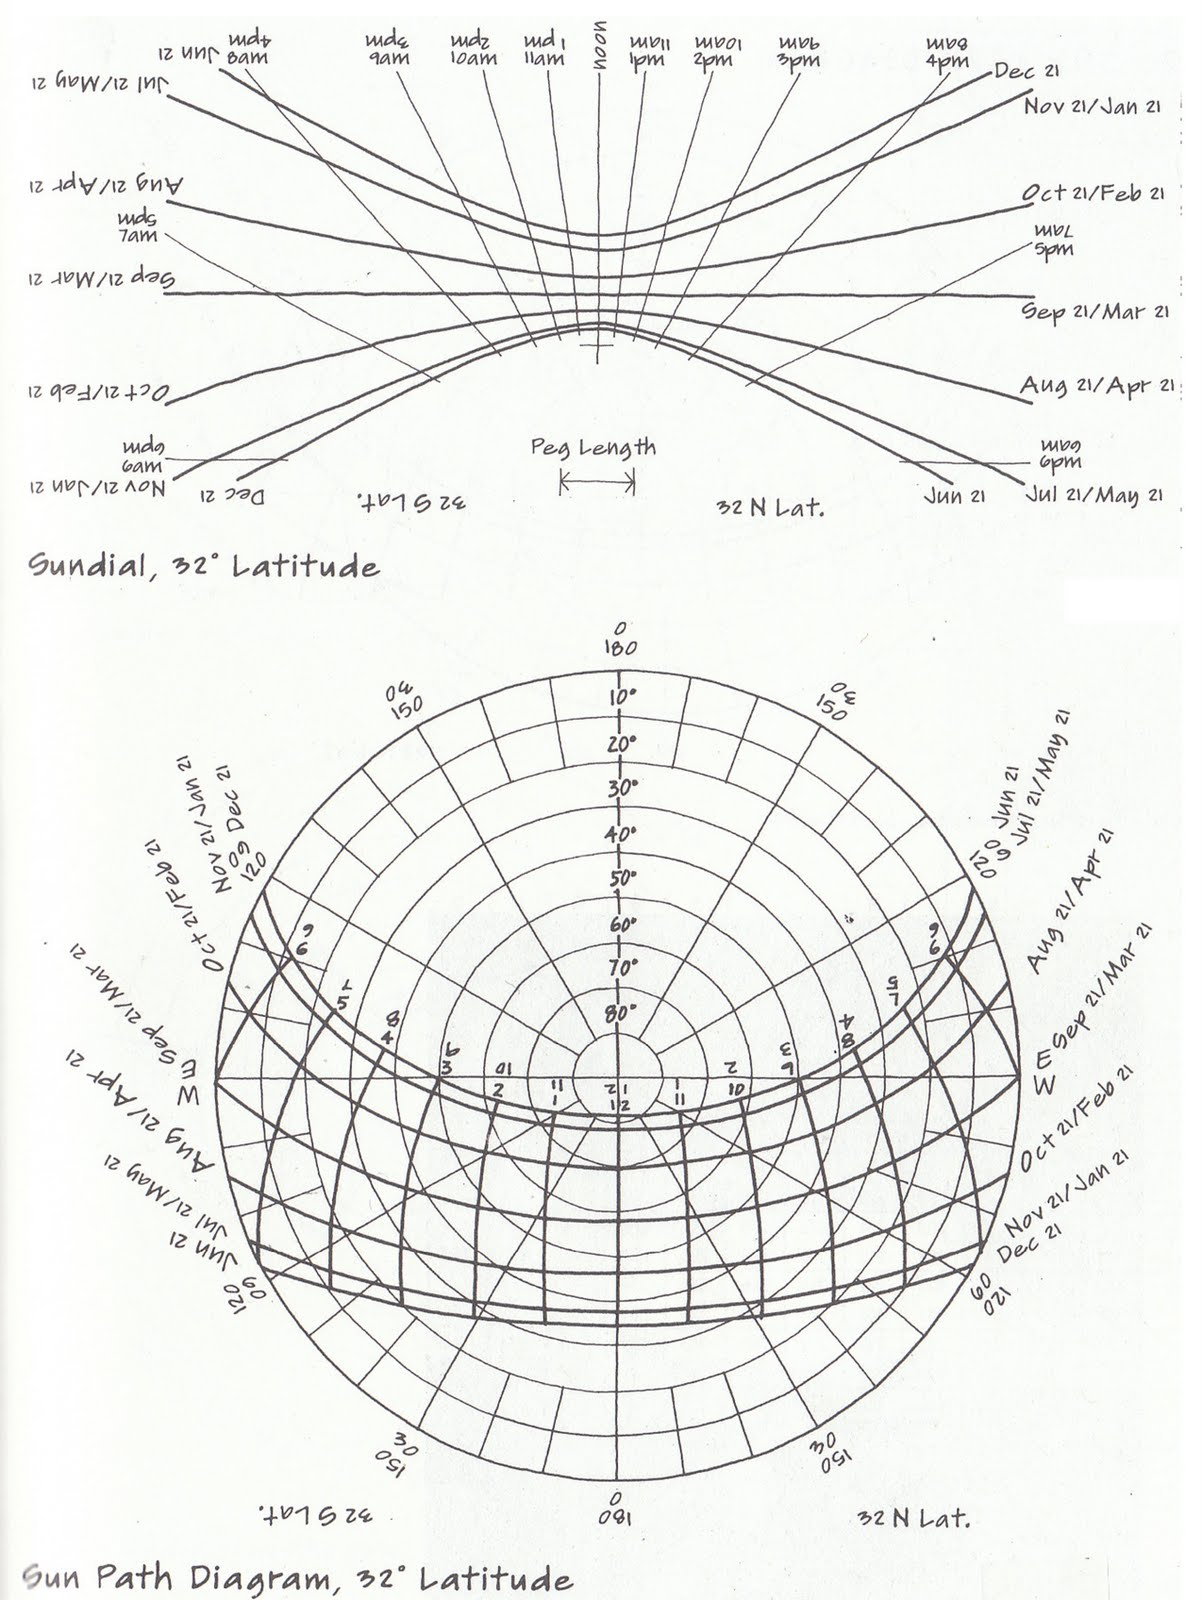 Flexibility Sustainability Architecture Yr5 Schematic